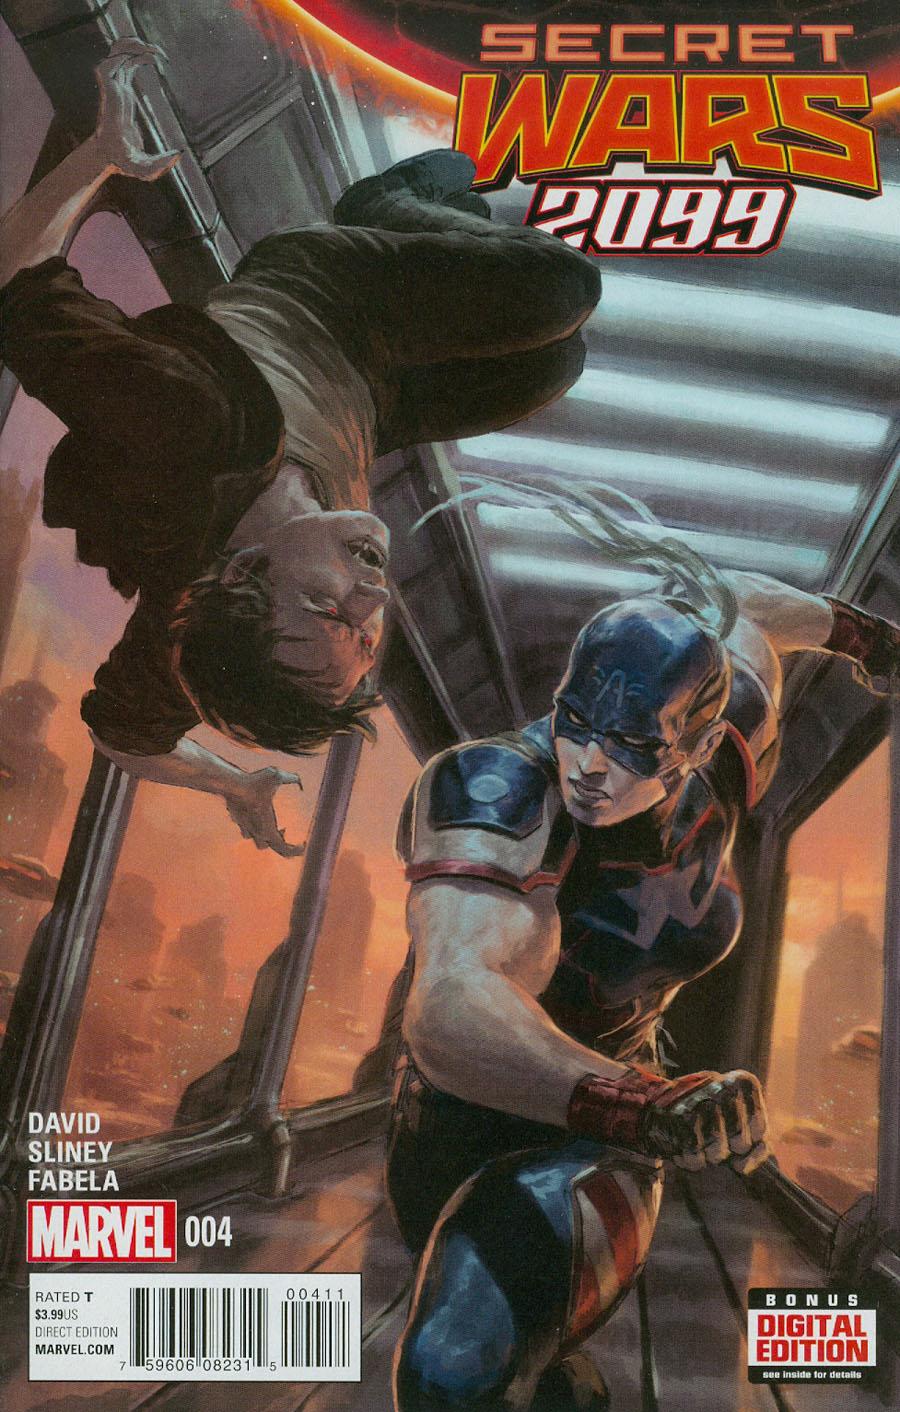 Secret Wars 2099 #4 (Secret Wars Warzones Tie-In)